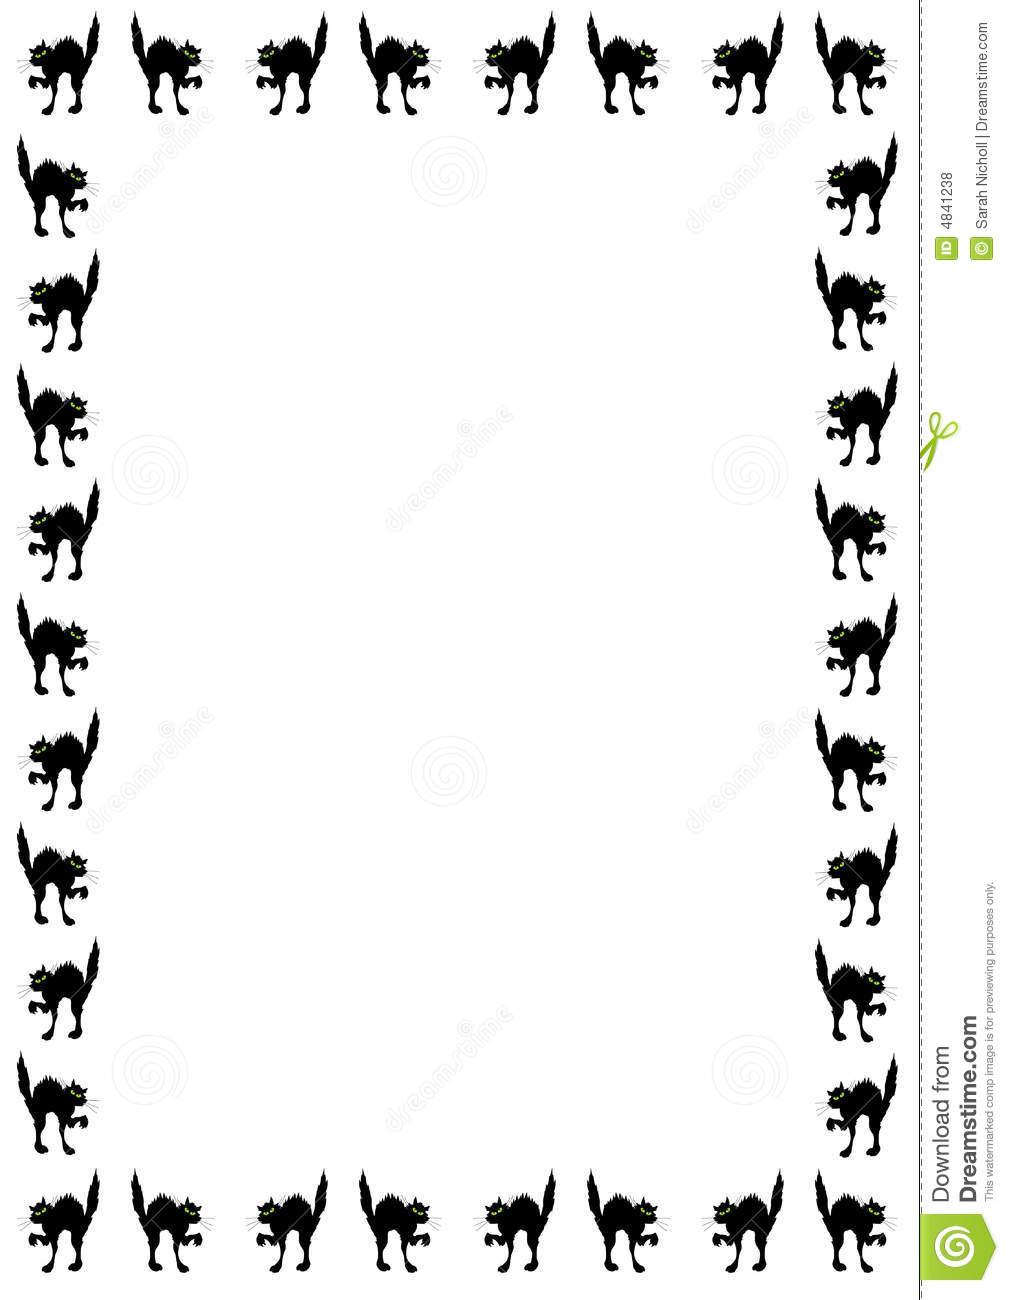 1009x1300 Halloween Border Clipart Black And White